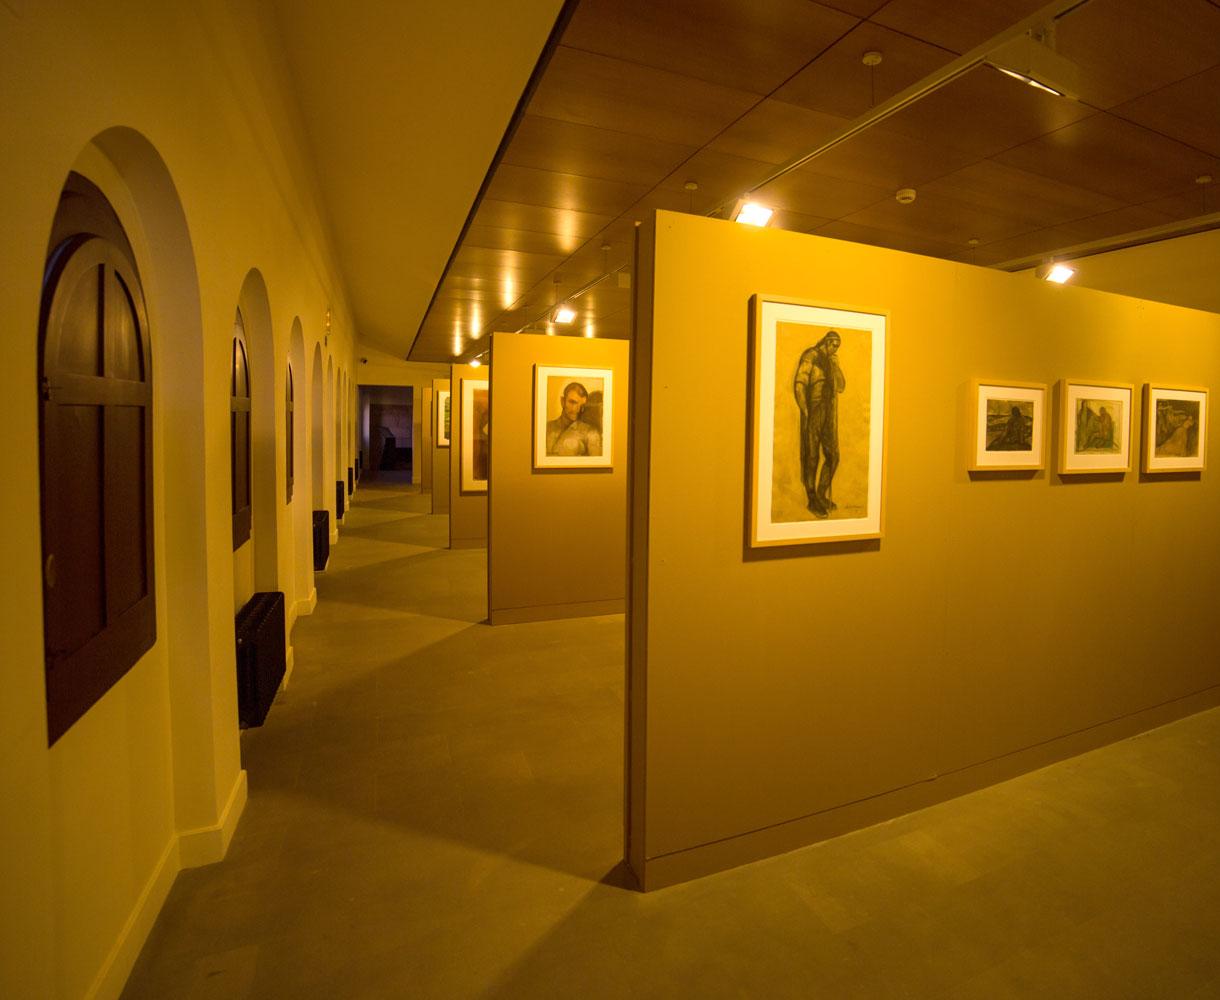 Sala 6 Museo Gustavo de Maeztu. Estella-Lizarra